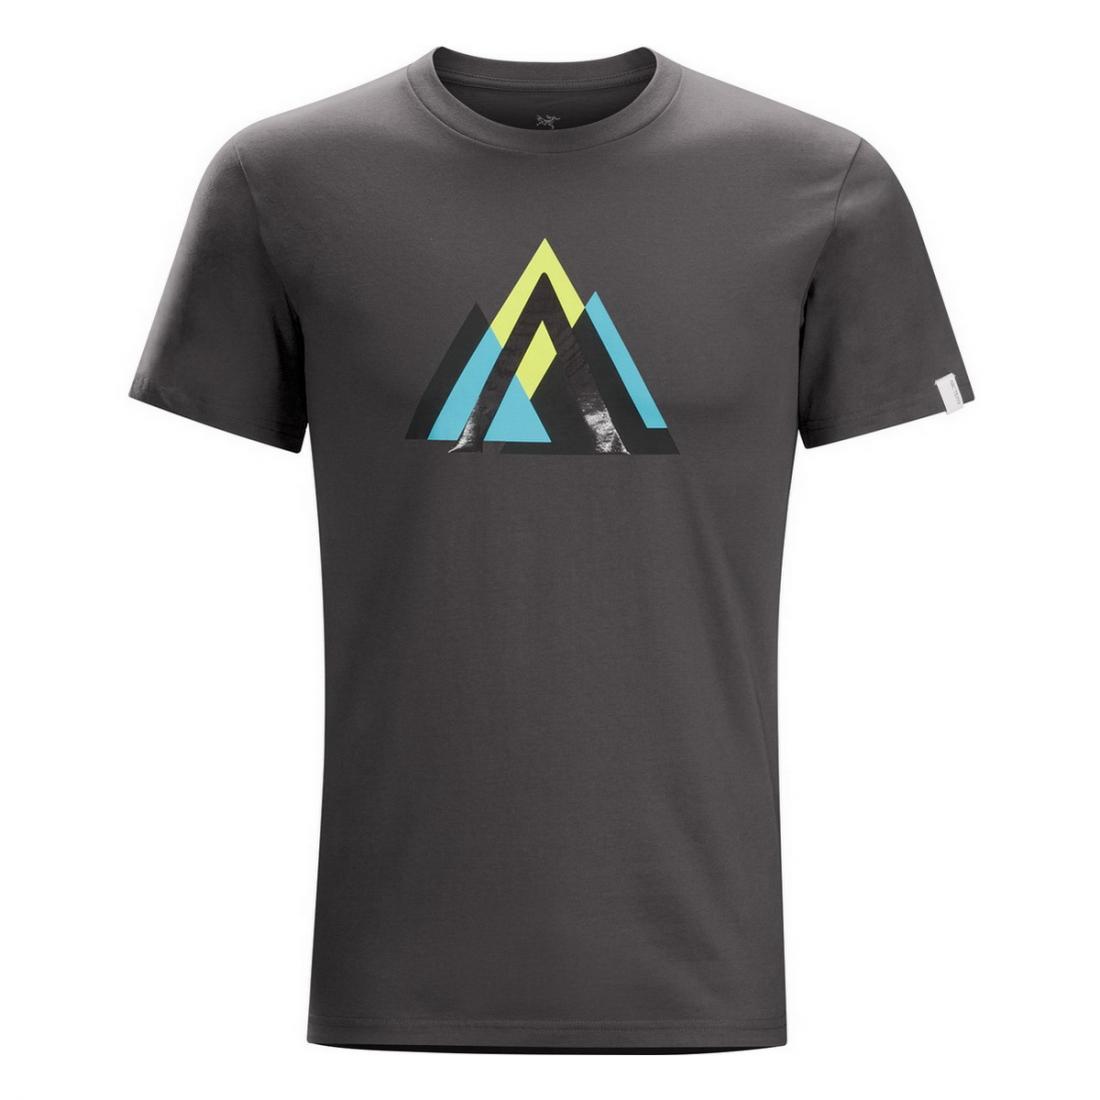 Футболка Arc Mountain SS T-Shirt муж.Футболки, поло<br><br><br>Цвет: Темно-серый<br>Размер: L